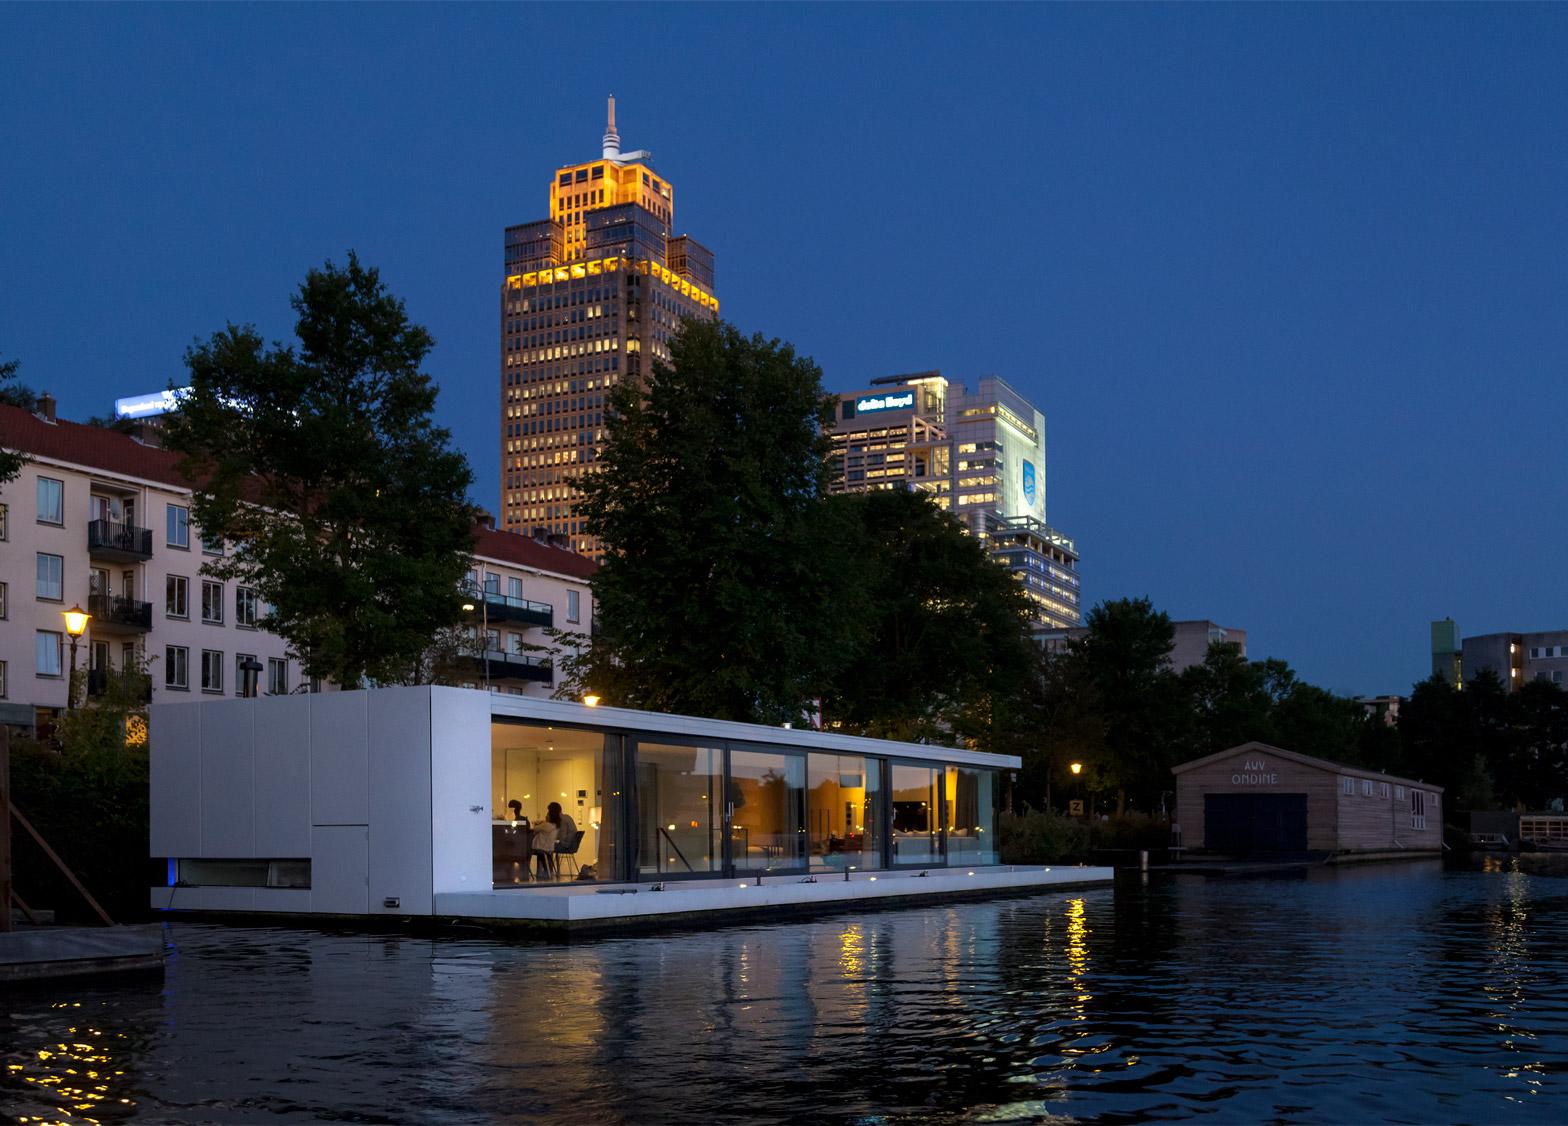 Amsterdam's river Amstel